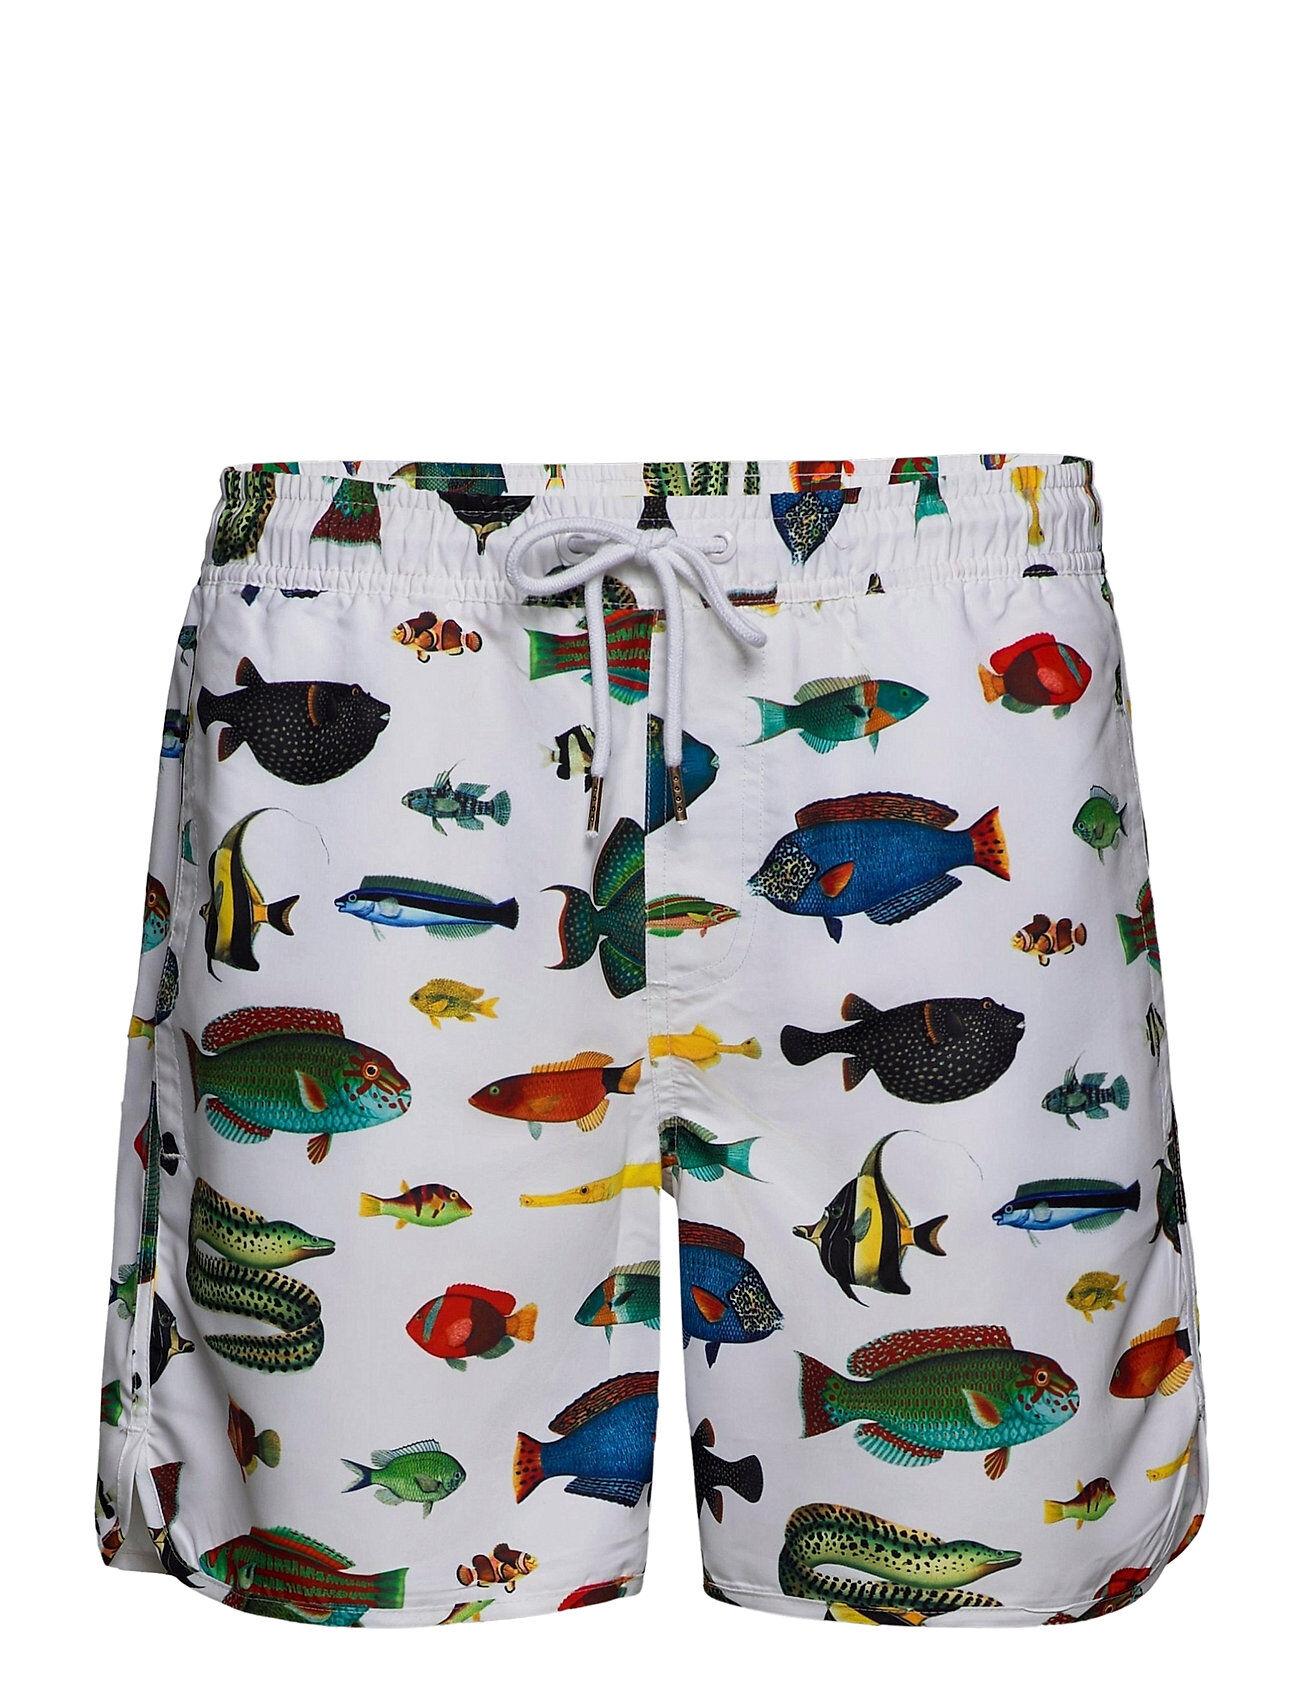 DEDICATED Swim Shorts Tropical Fish Badeshorts Hvit DEDICATED